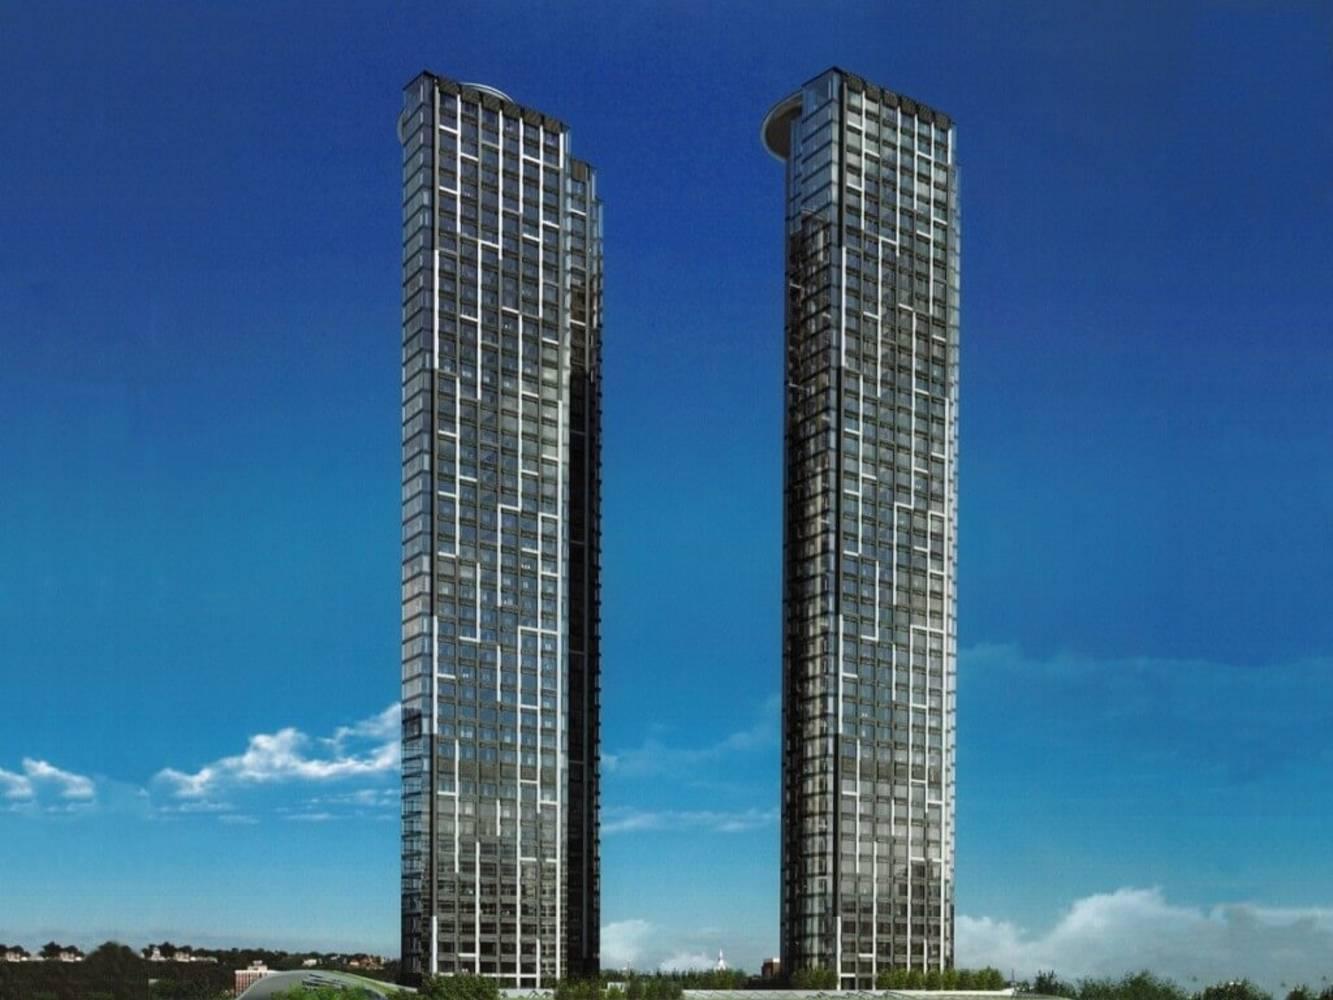 Çiftçi Towers